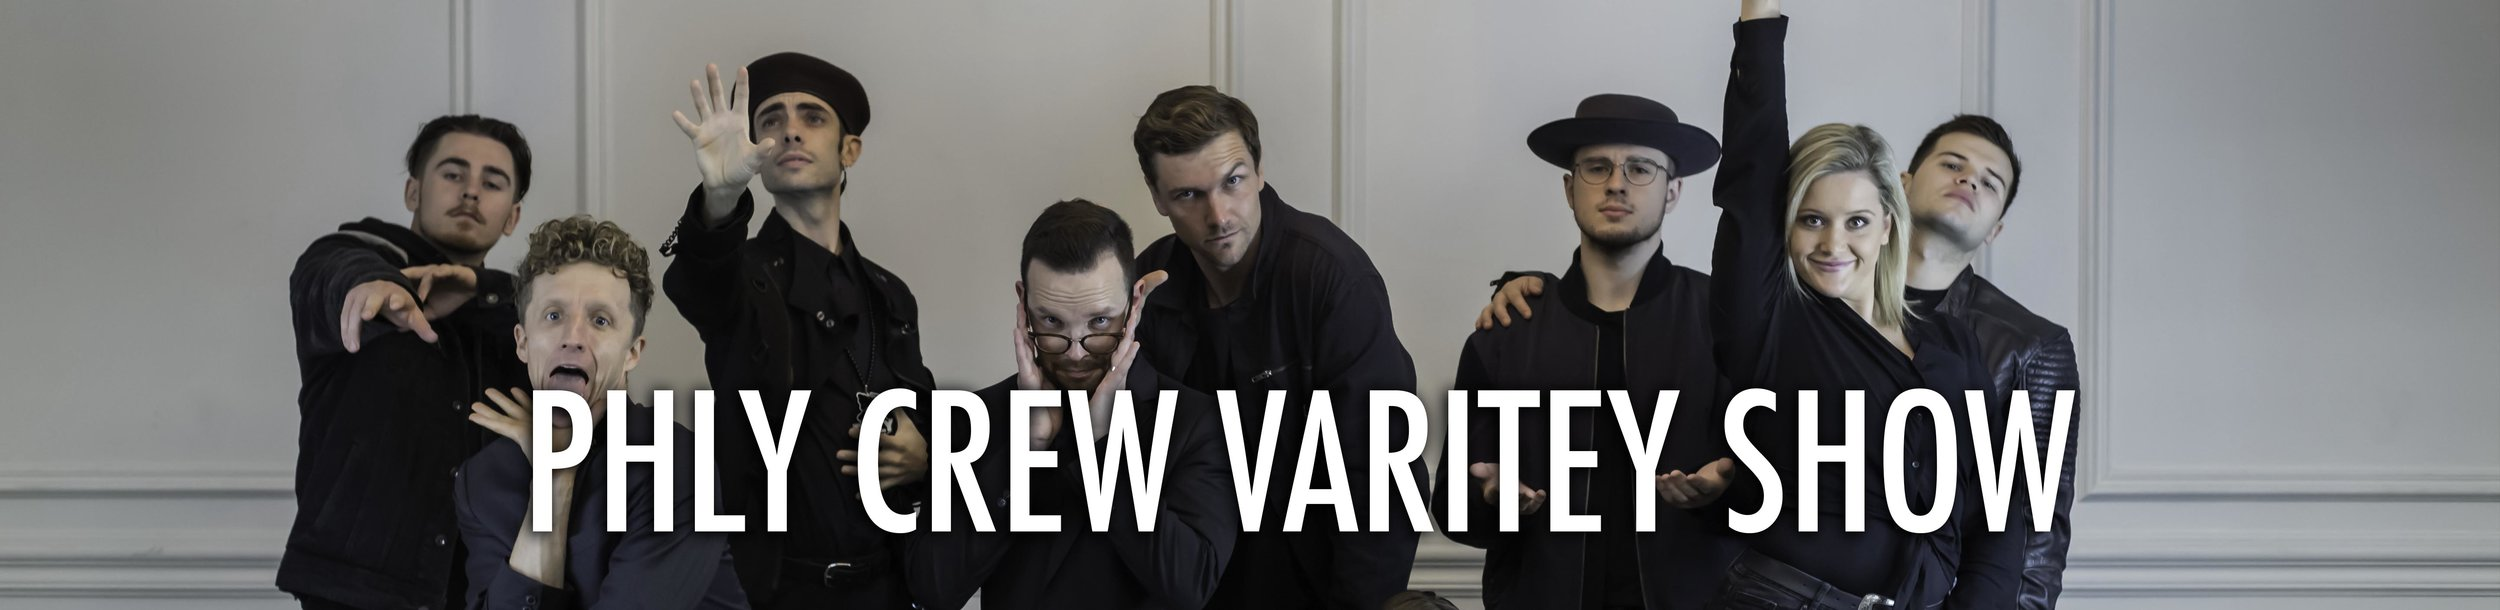 Phly Crew Variety show h.jpg